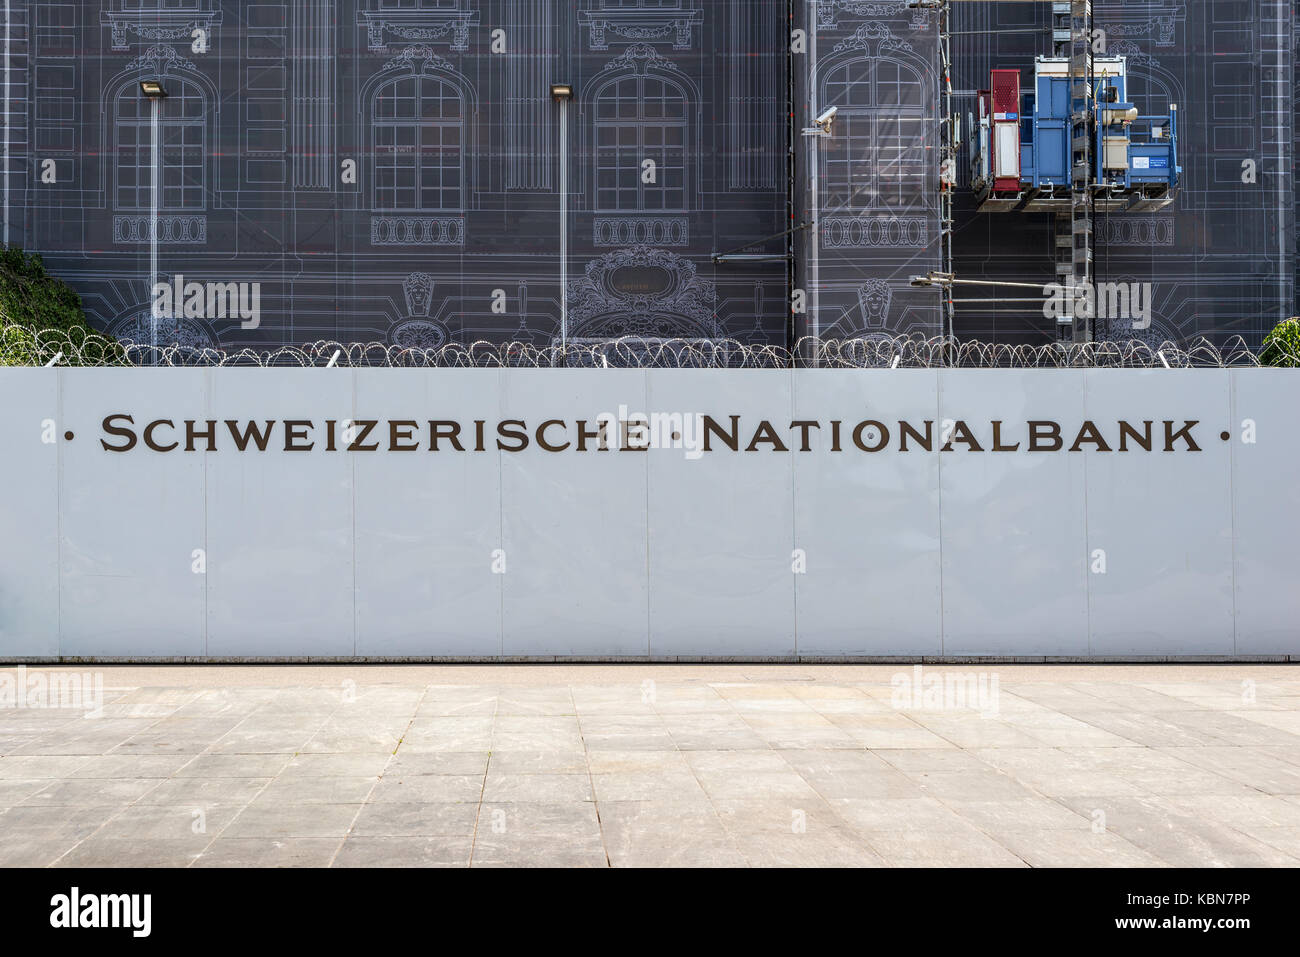 Bern, Switzerland - May 26, 2016: Repair of the facade of the Swiss National Bank in Bern, Switzerland. Building Stock Photo